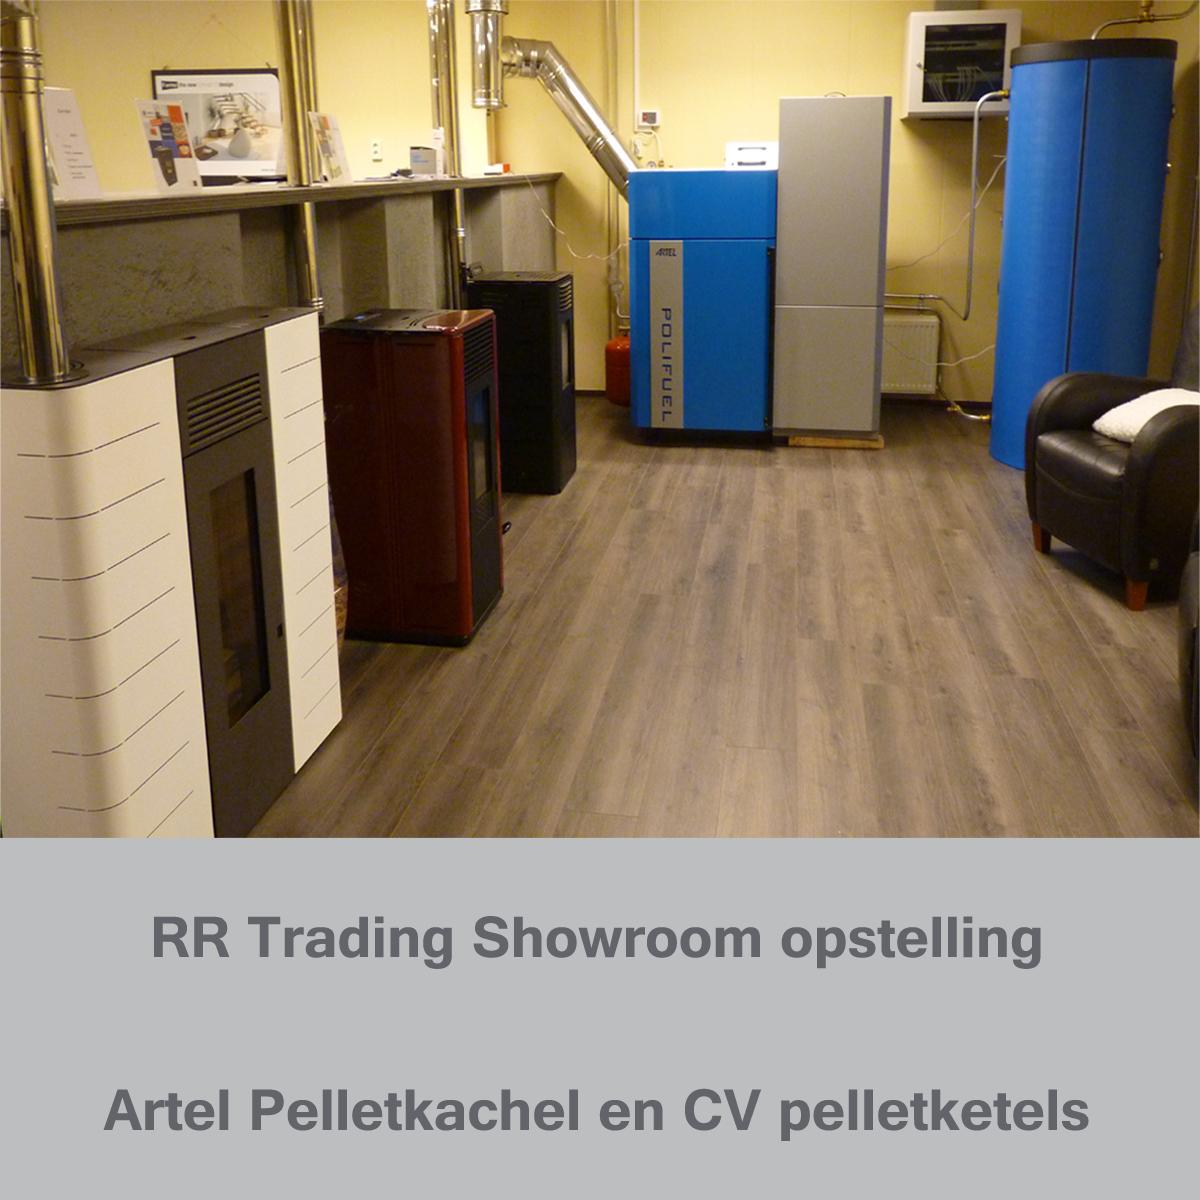 Artel pelletkachel showroom